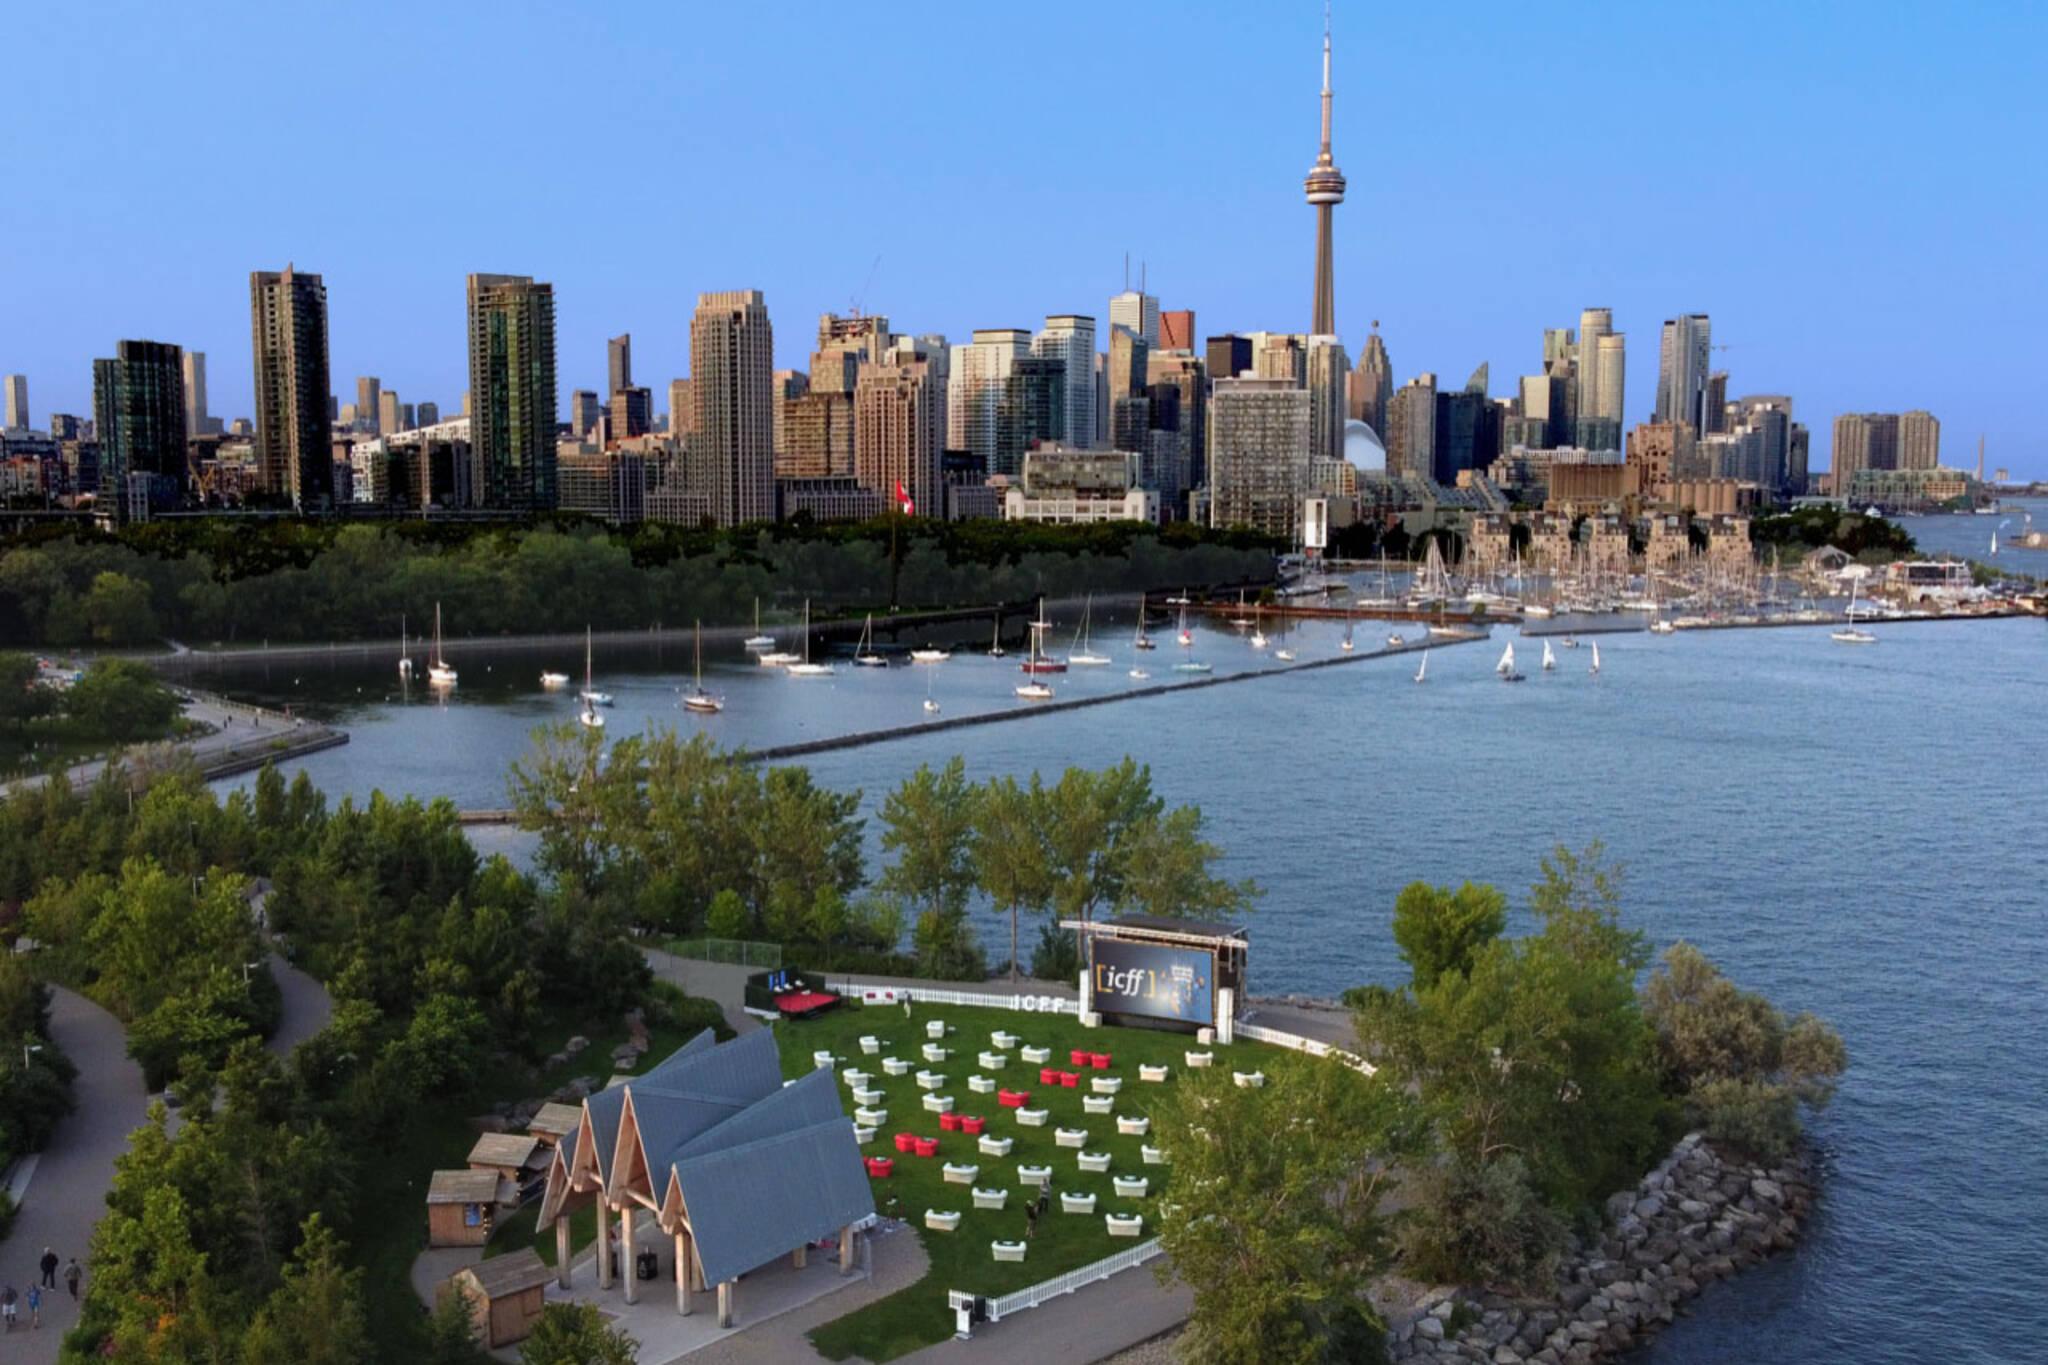 ICFF Toronto